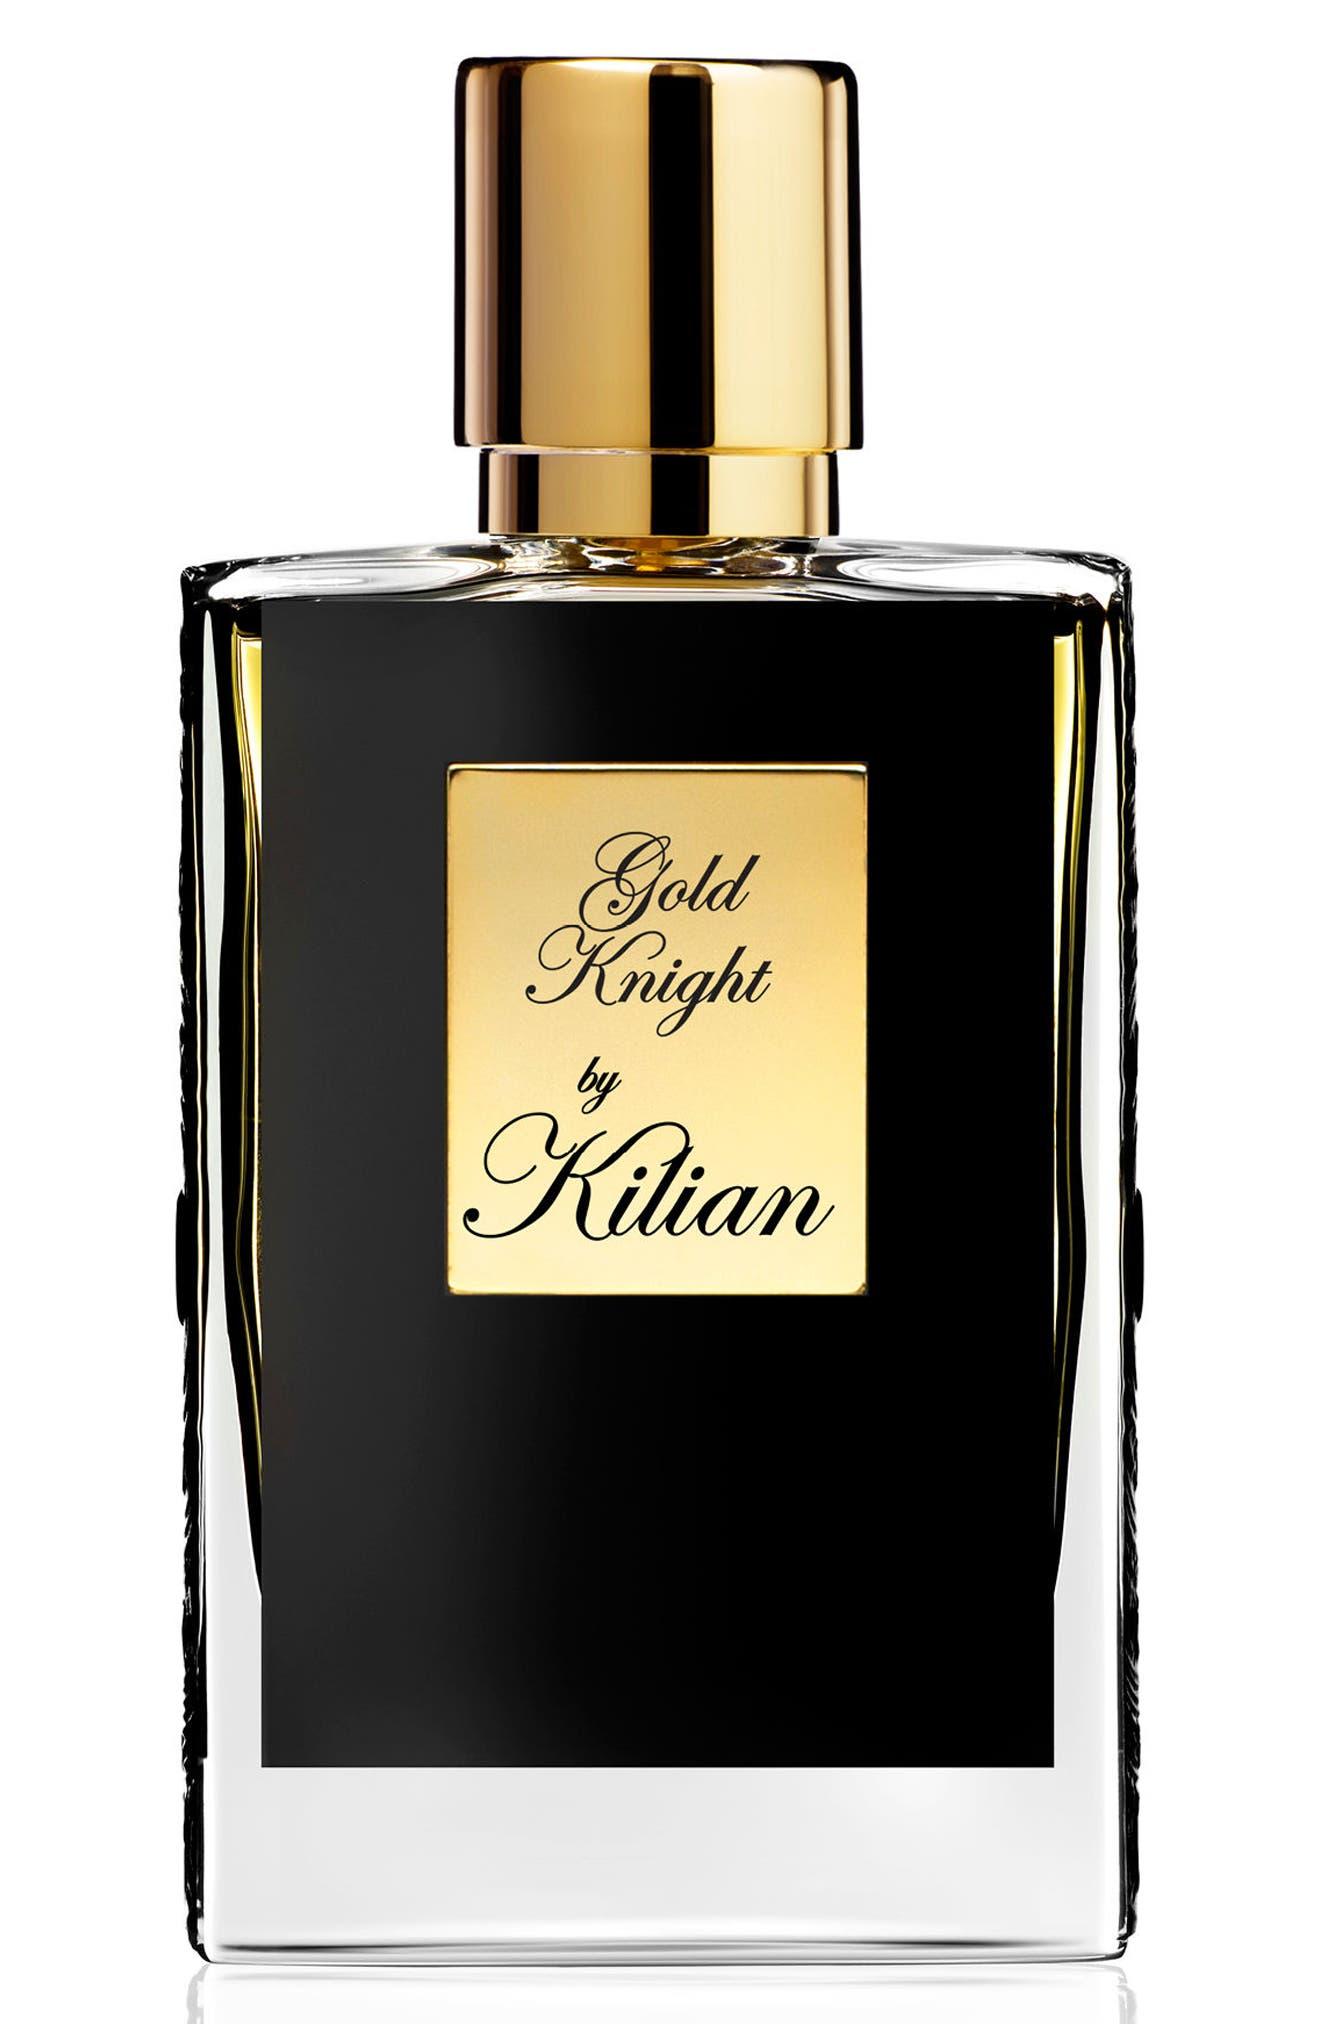 Gold Knight Refillable Spray Collector's Edition,                         Main,                         color, No Color